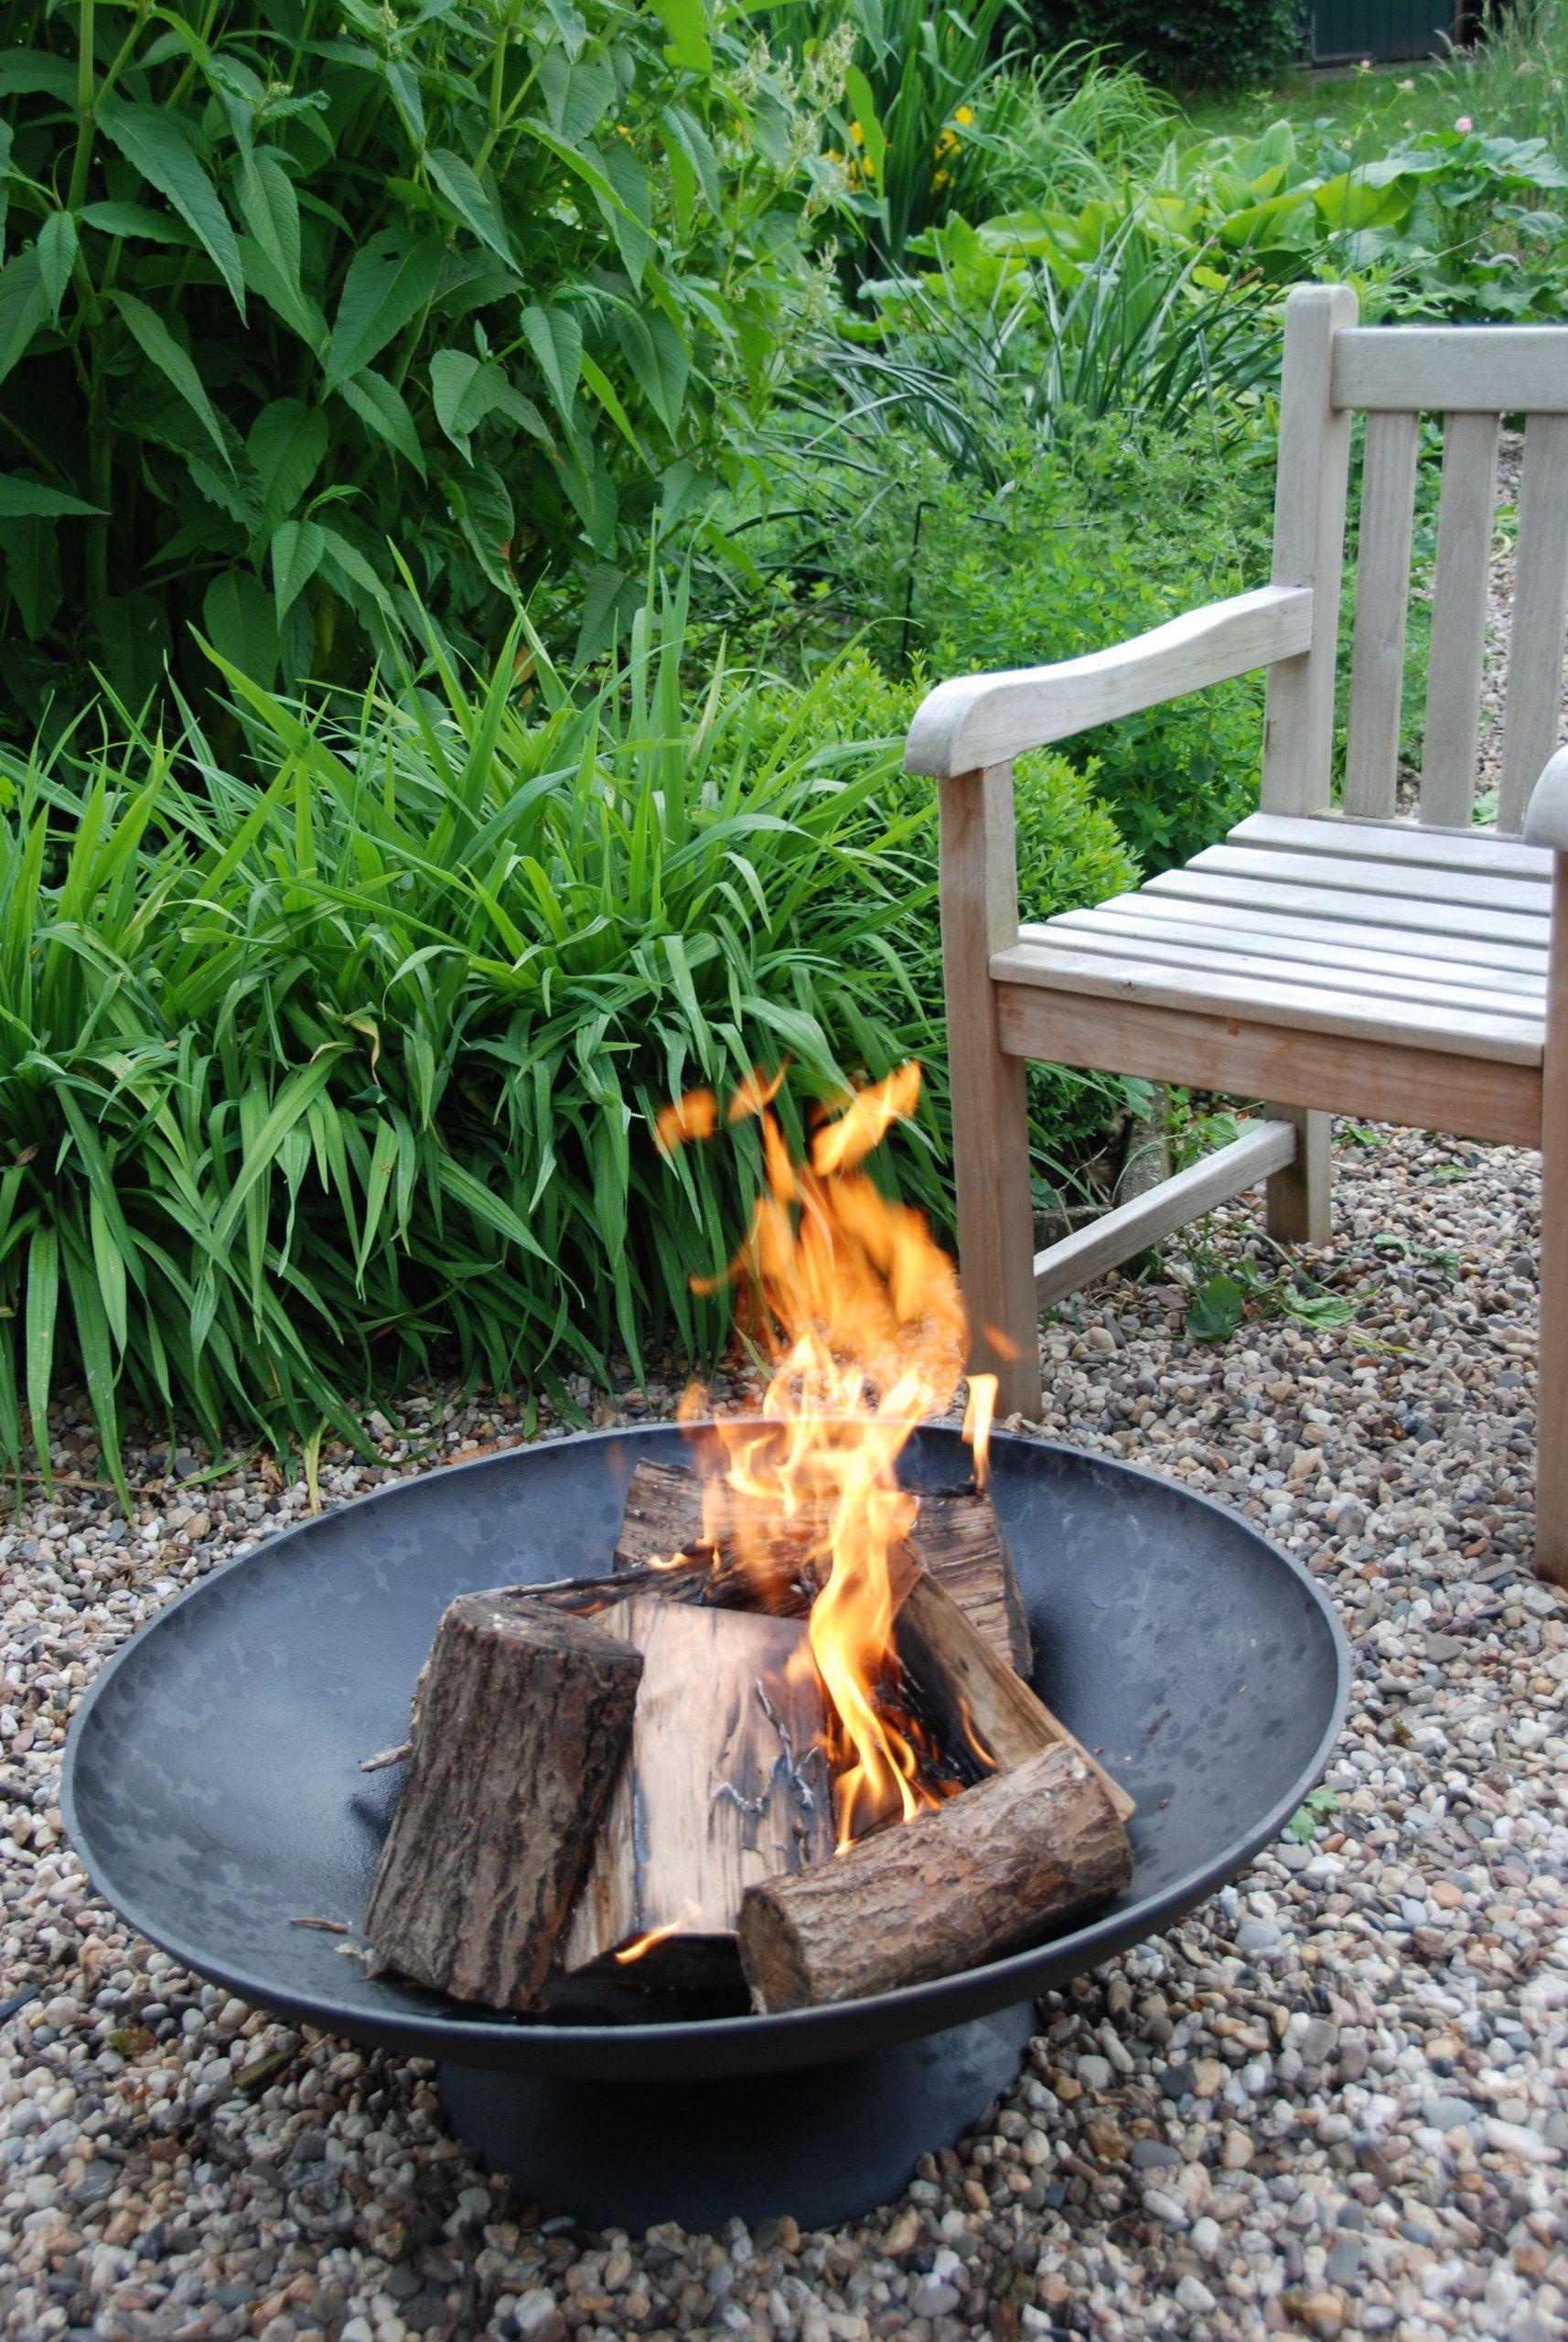 Amazon Com Esschert Design Ff90 Fire Bowl X Large Outdoor Fireplaces Patio Lawn Garden Fire Bowls Wood Fire Pit Cool Fire Pits